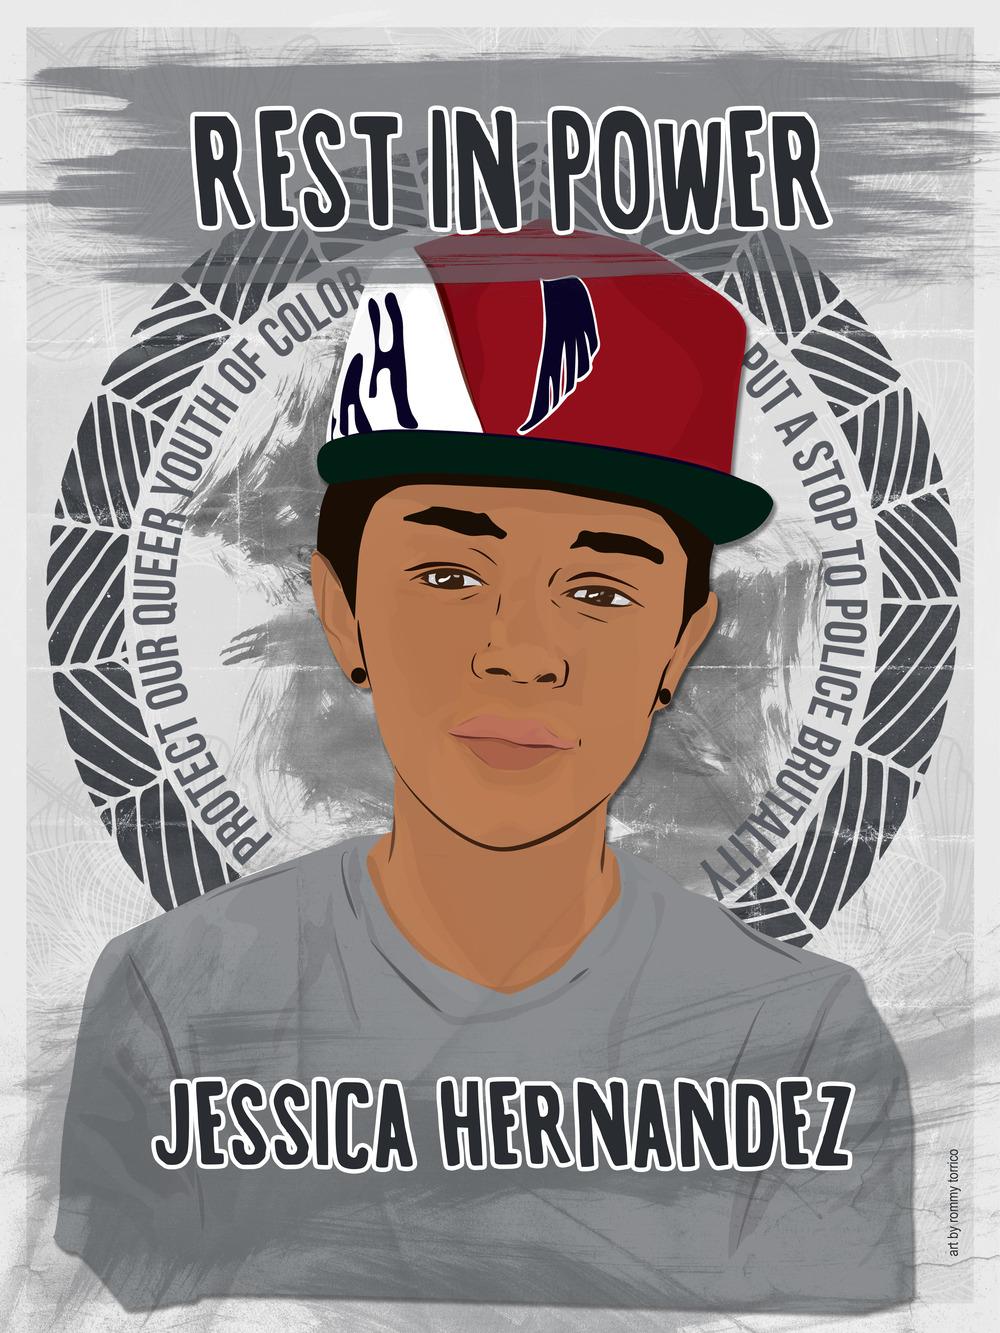 Jessie Hernandez